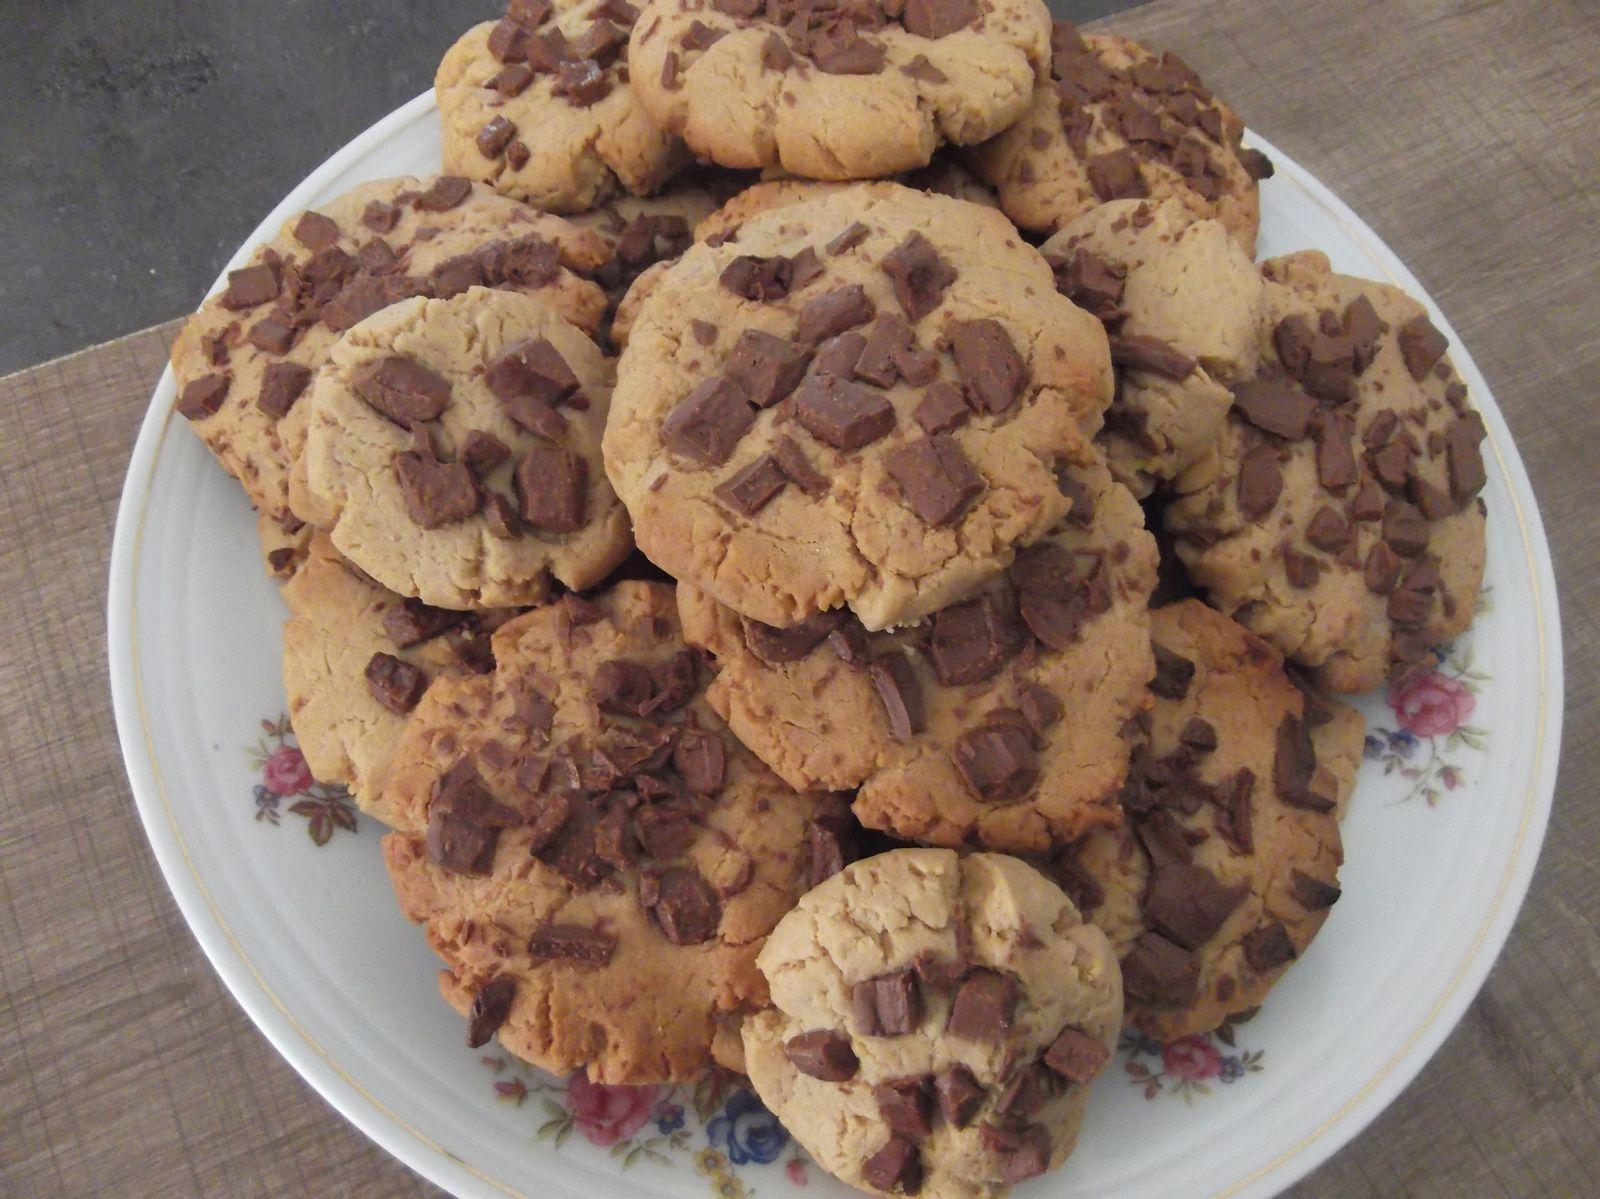 Cookies beurre de cacahuete mes sweet delices - Cookies beurre de cacahuete ...